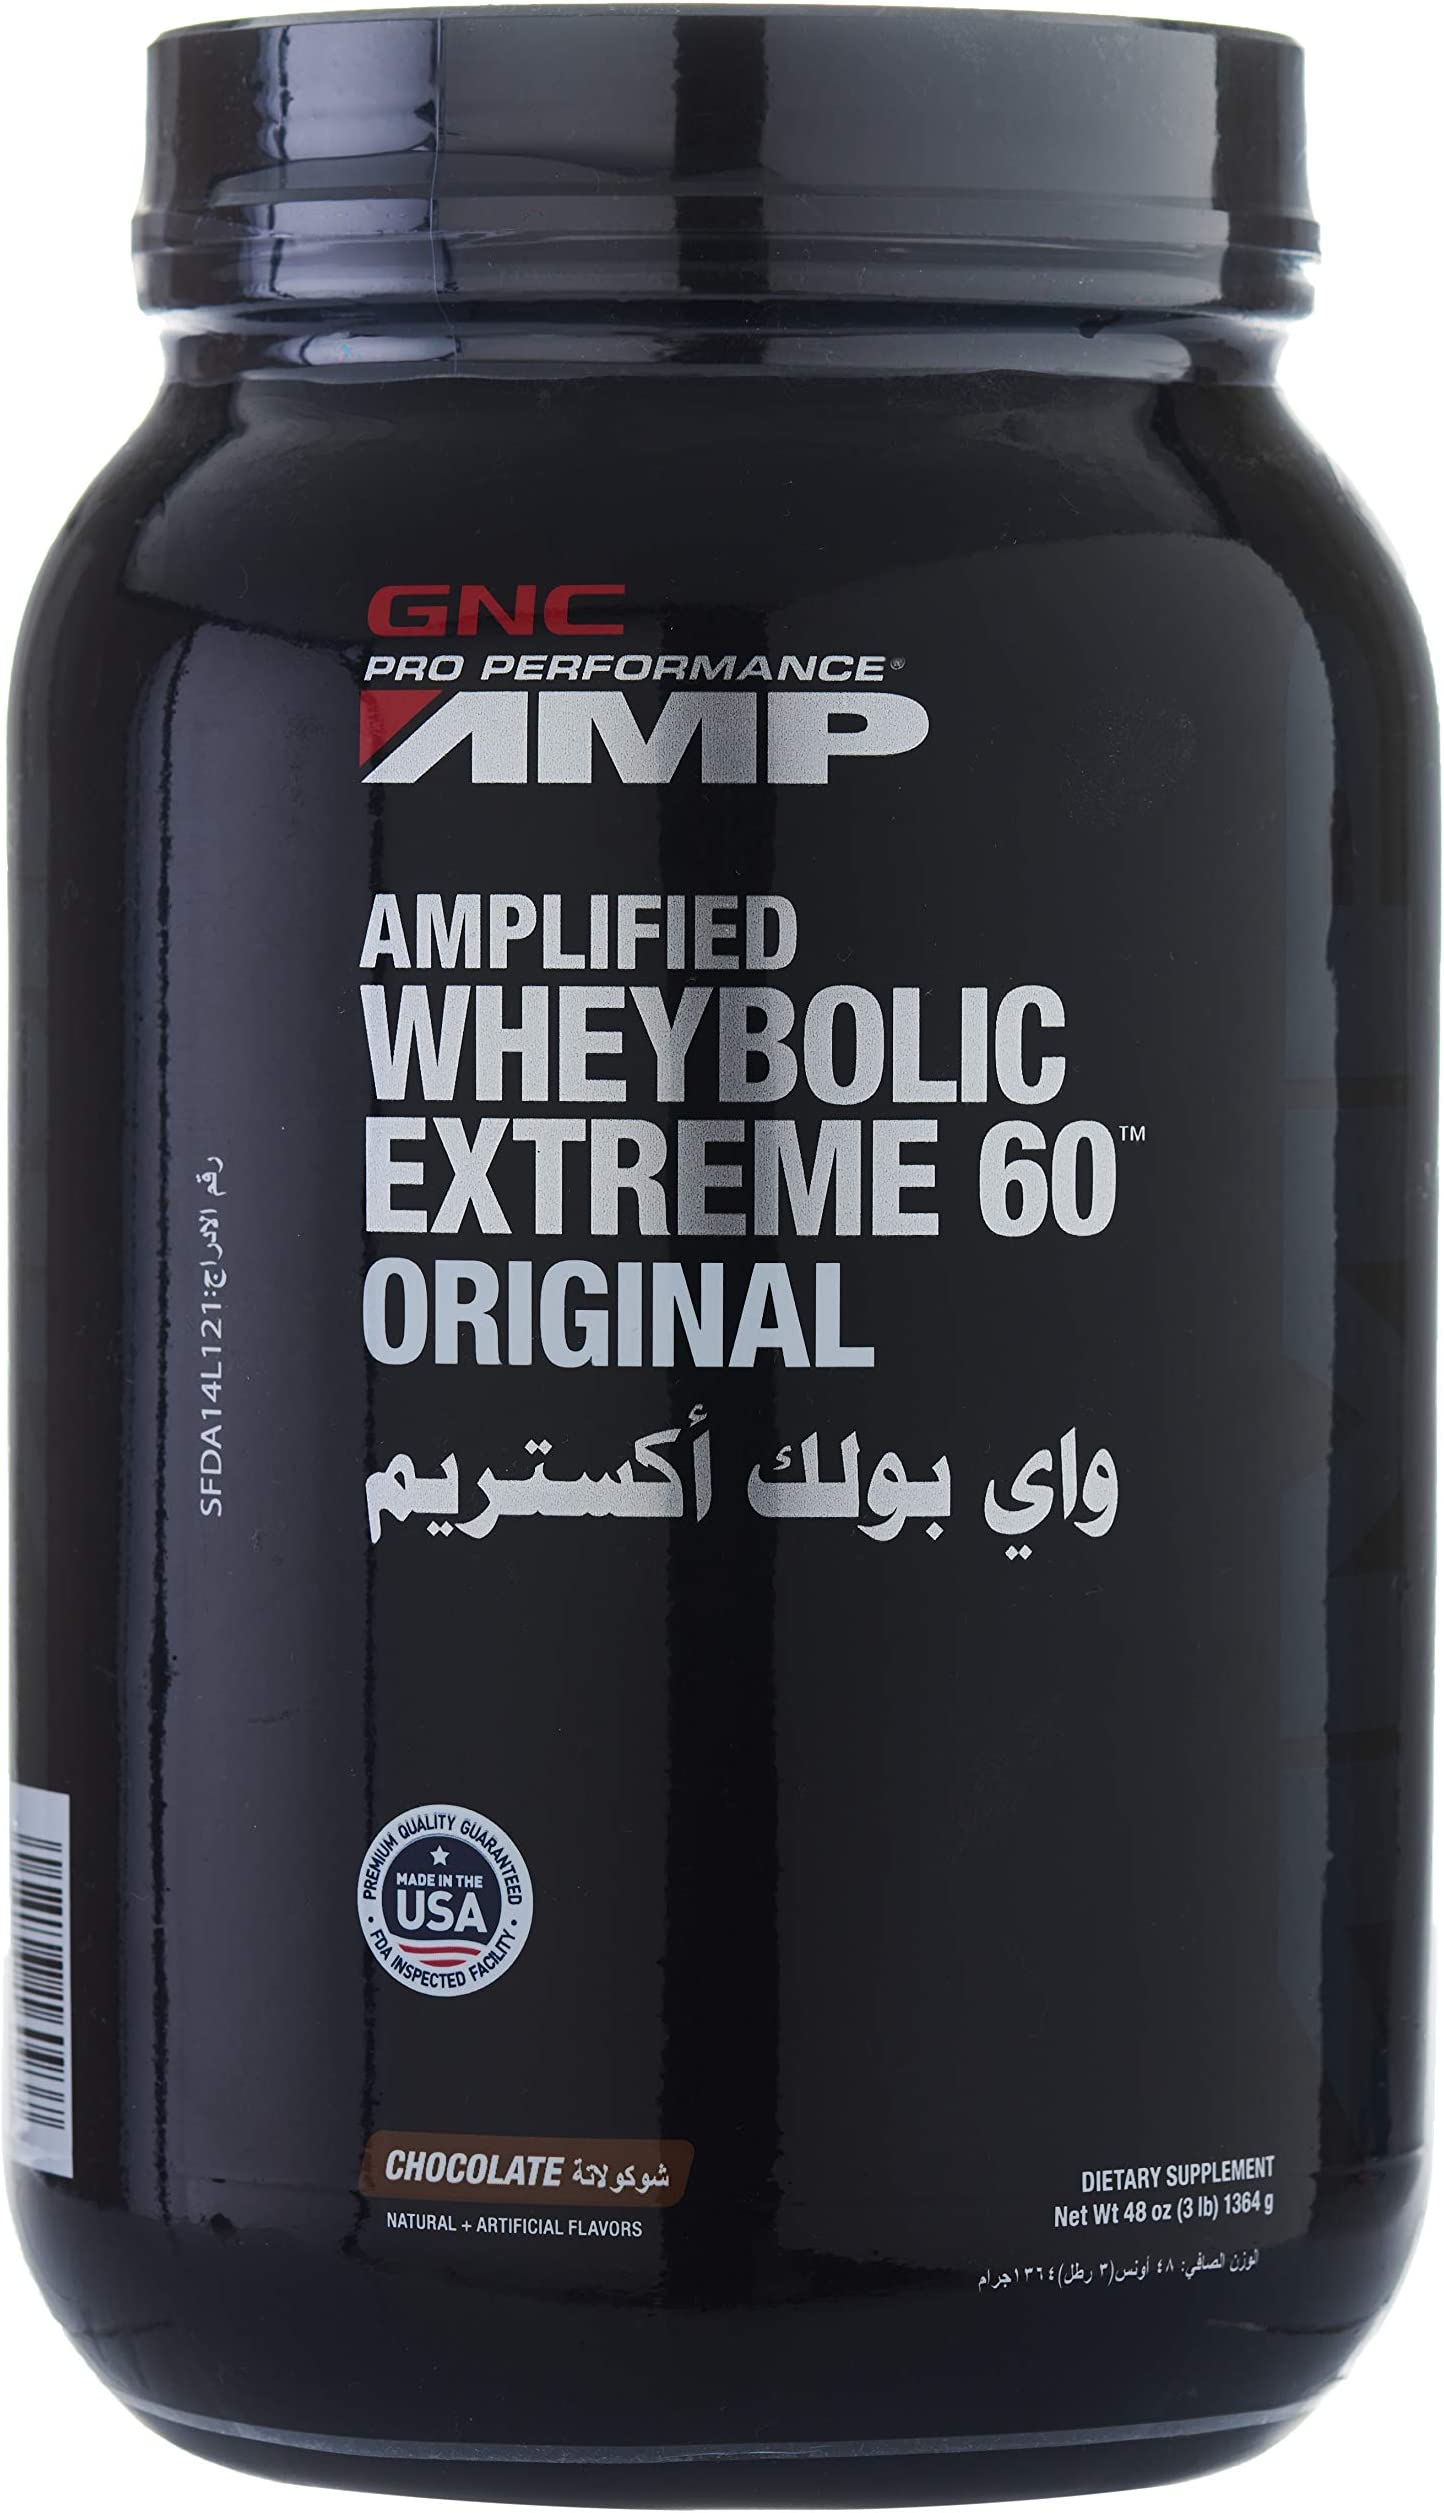 Gnc Amplified Wheybolic Extreme 60 Chocolate 3 Lb Price In Saudi Arabia Amazon Saudi Arabia Kanbkam,Dog Seizures Signs